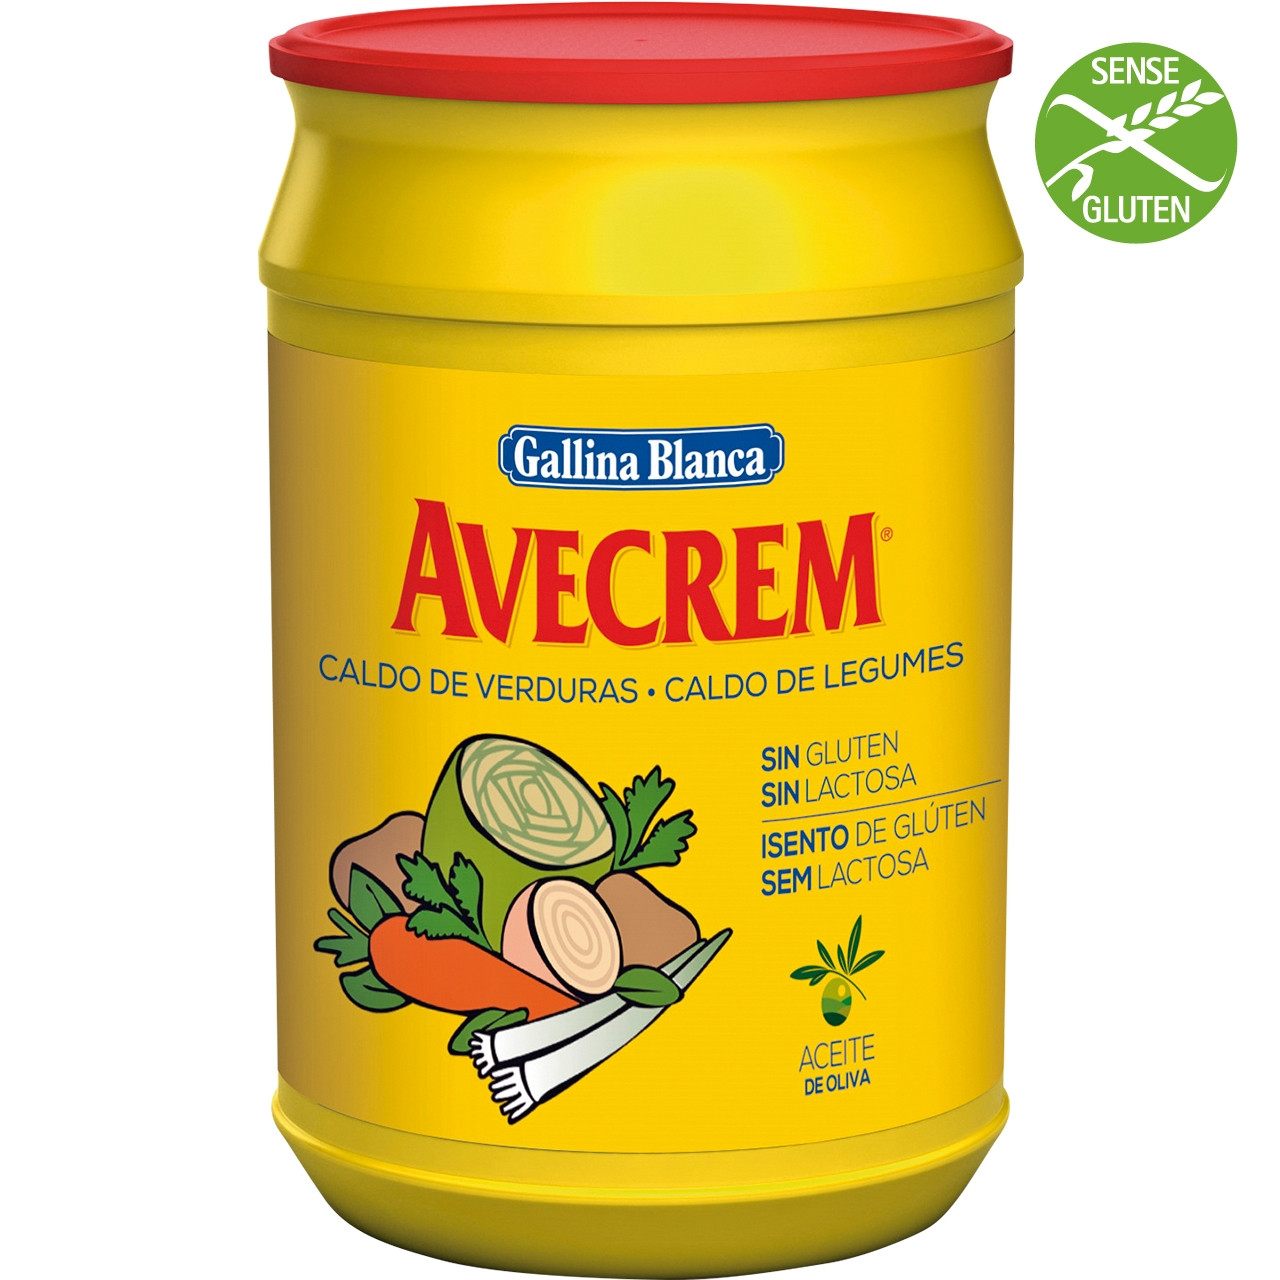 Brou verdures sense gluten Avecrem